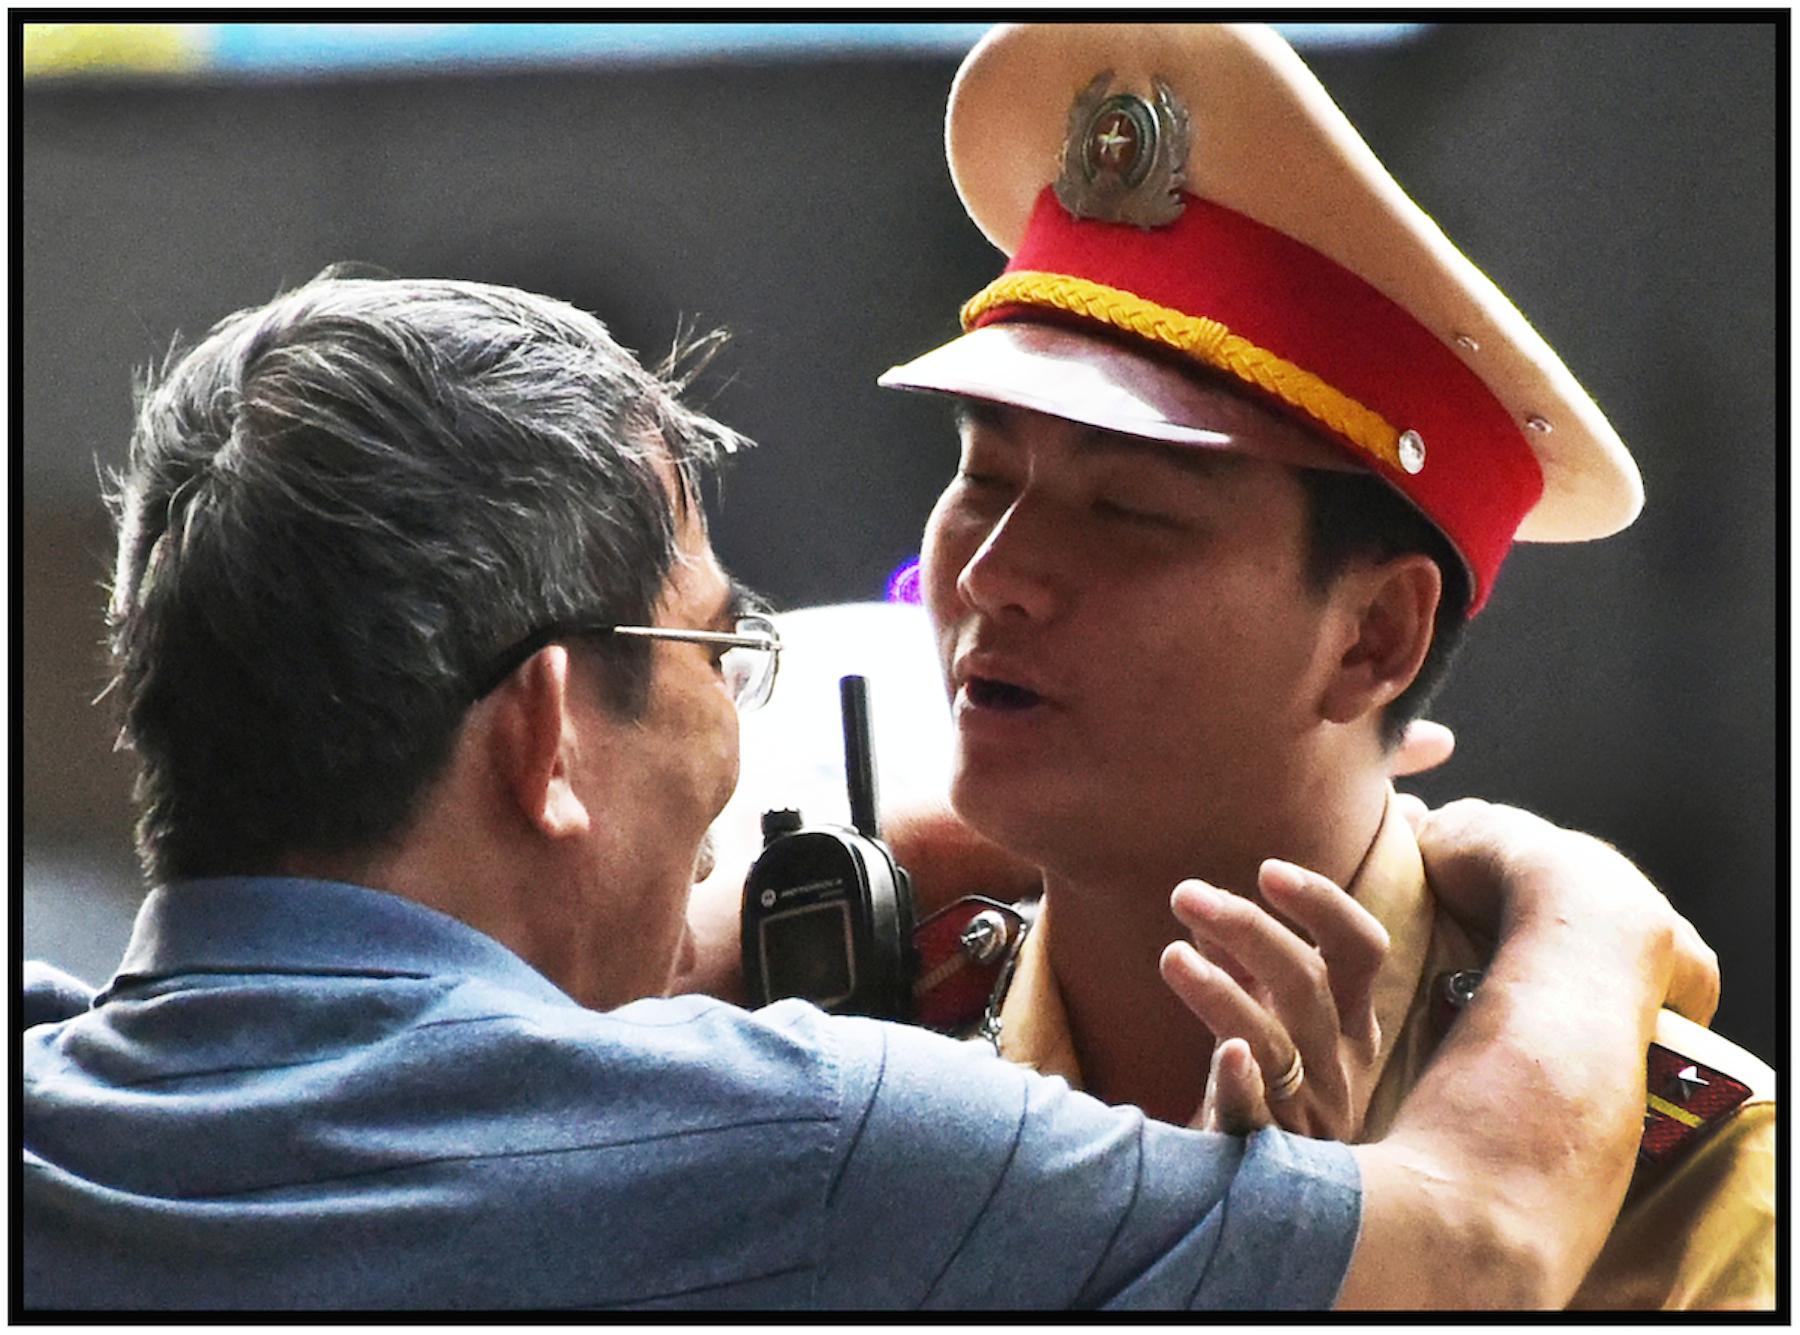 Traffic cop and drunkard, Saigon/HCMC, Dec. 2015. #7241